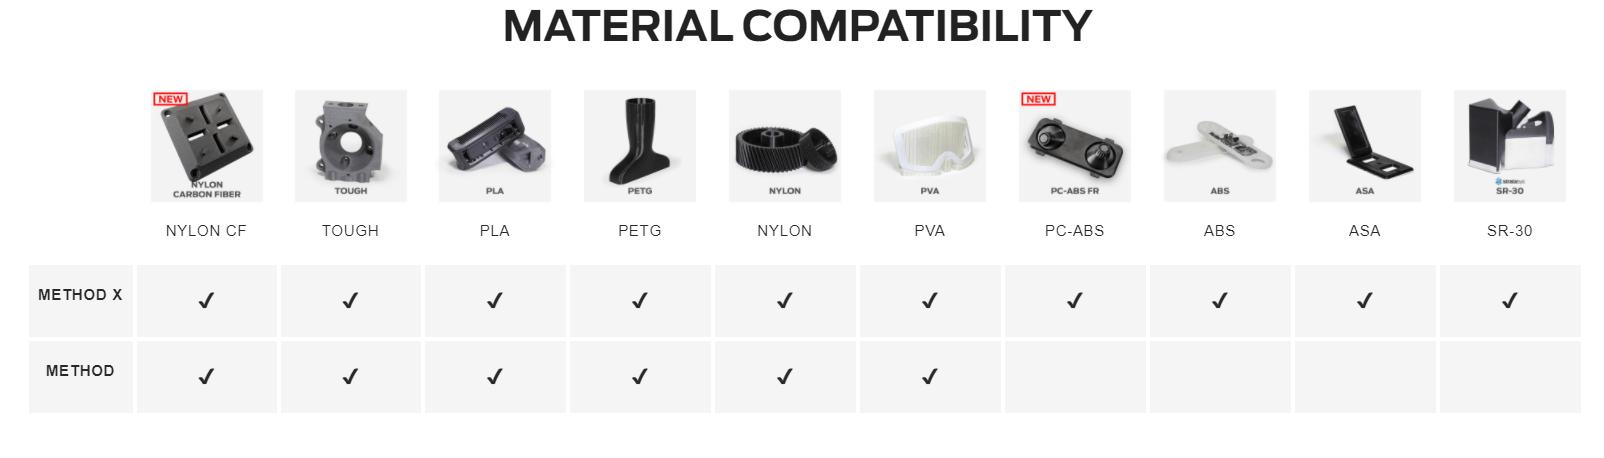 Stratasys Material compatibility